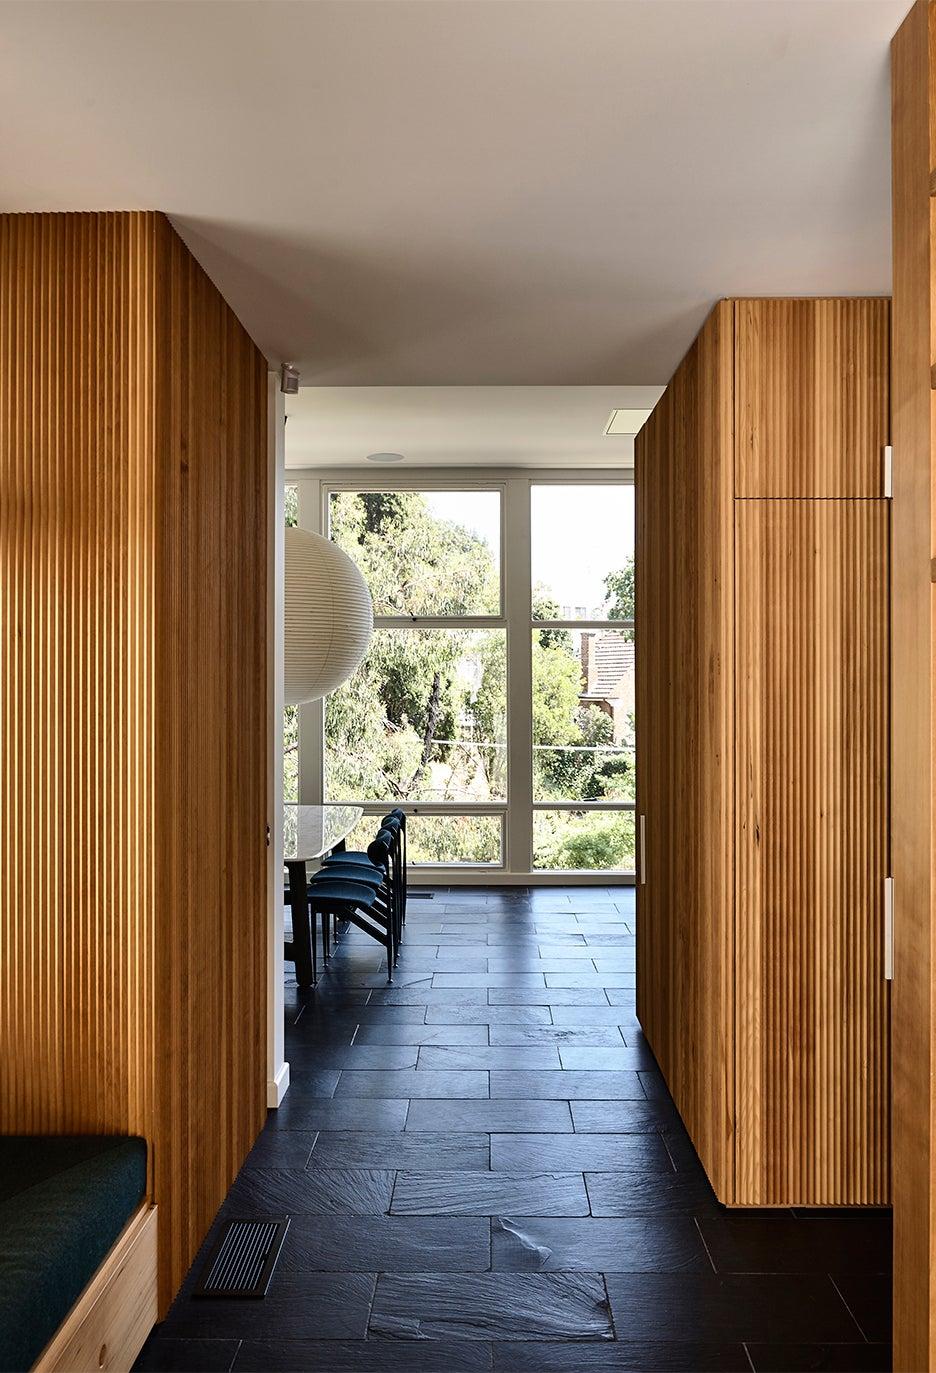 kithcen with wood paneled walls